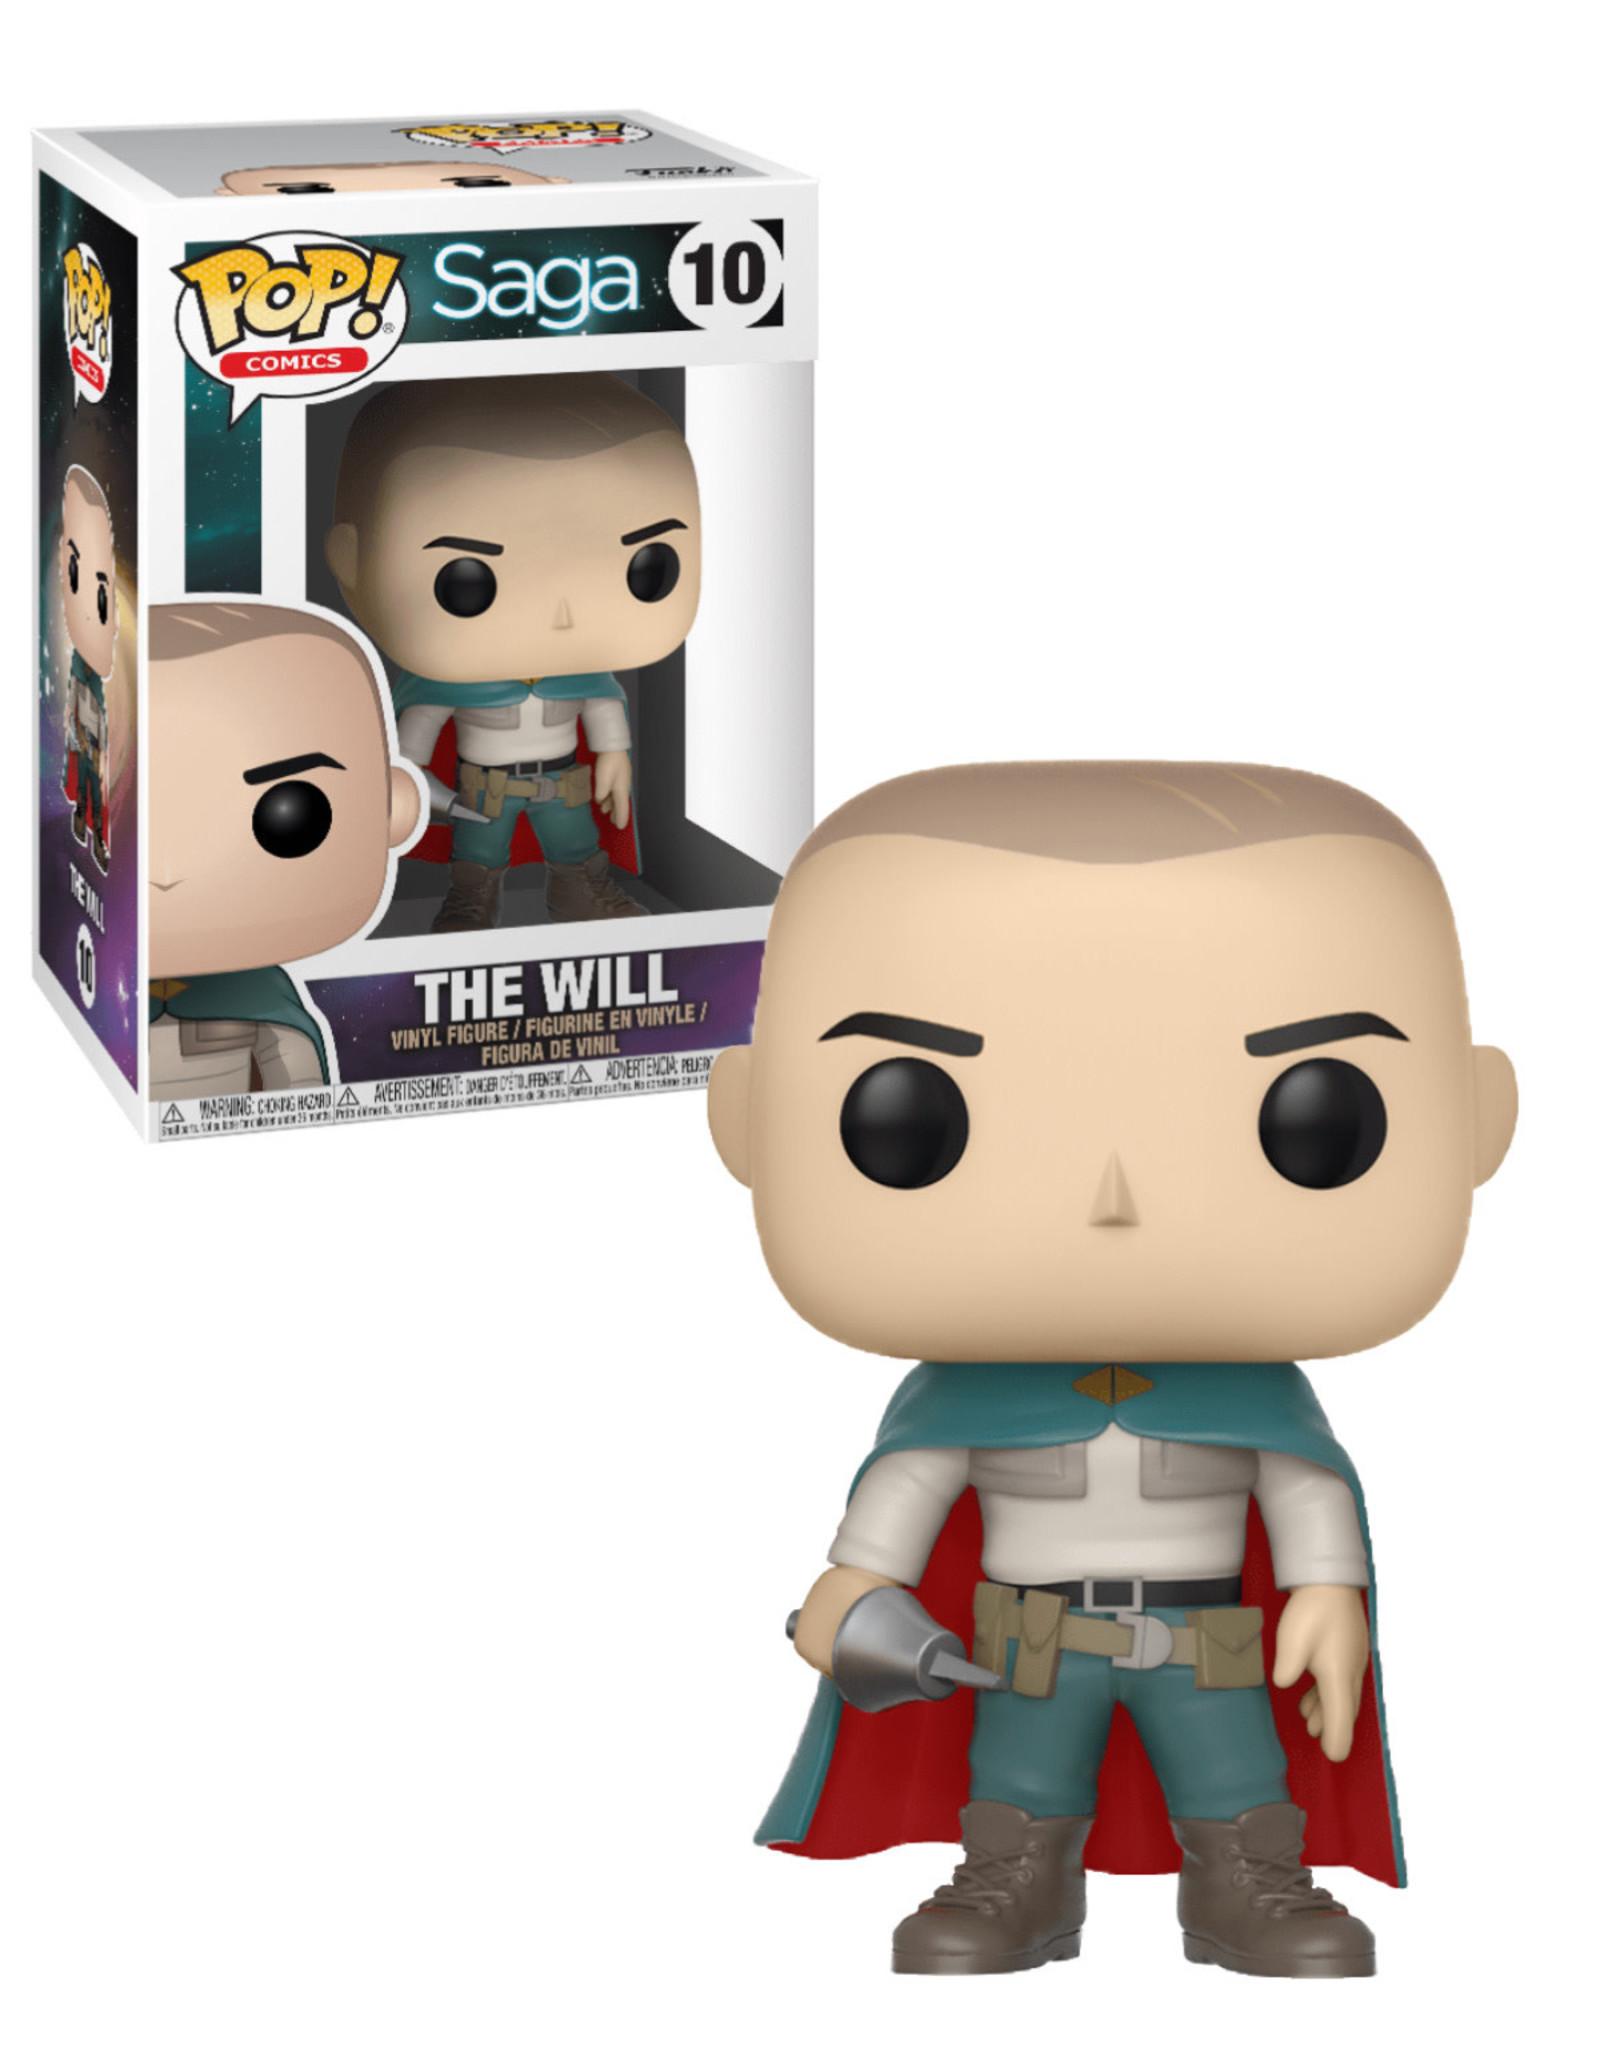 Saga 10 ( Funko Pop ) The Will